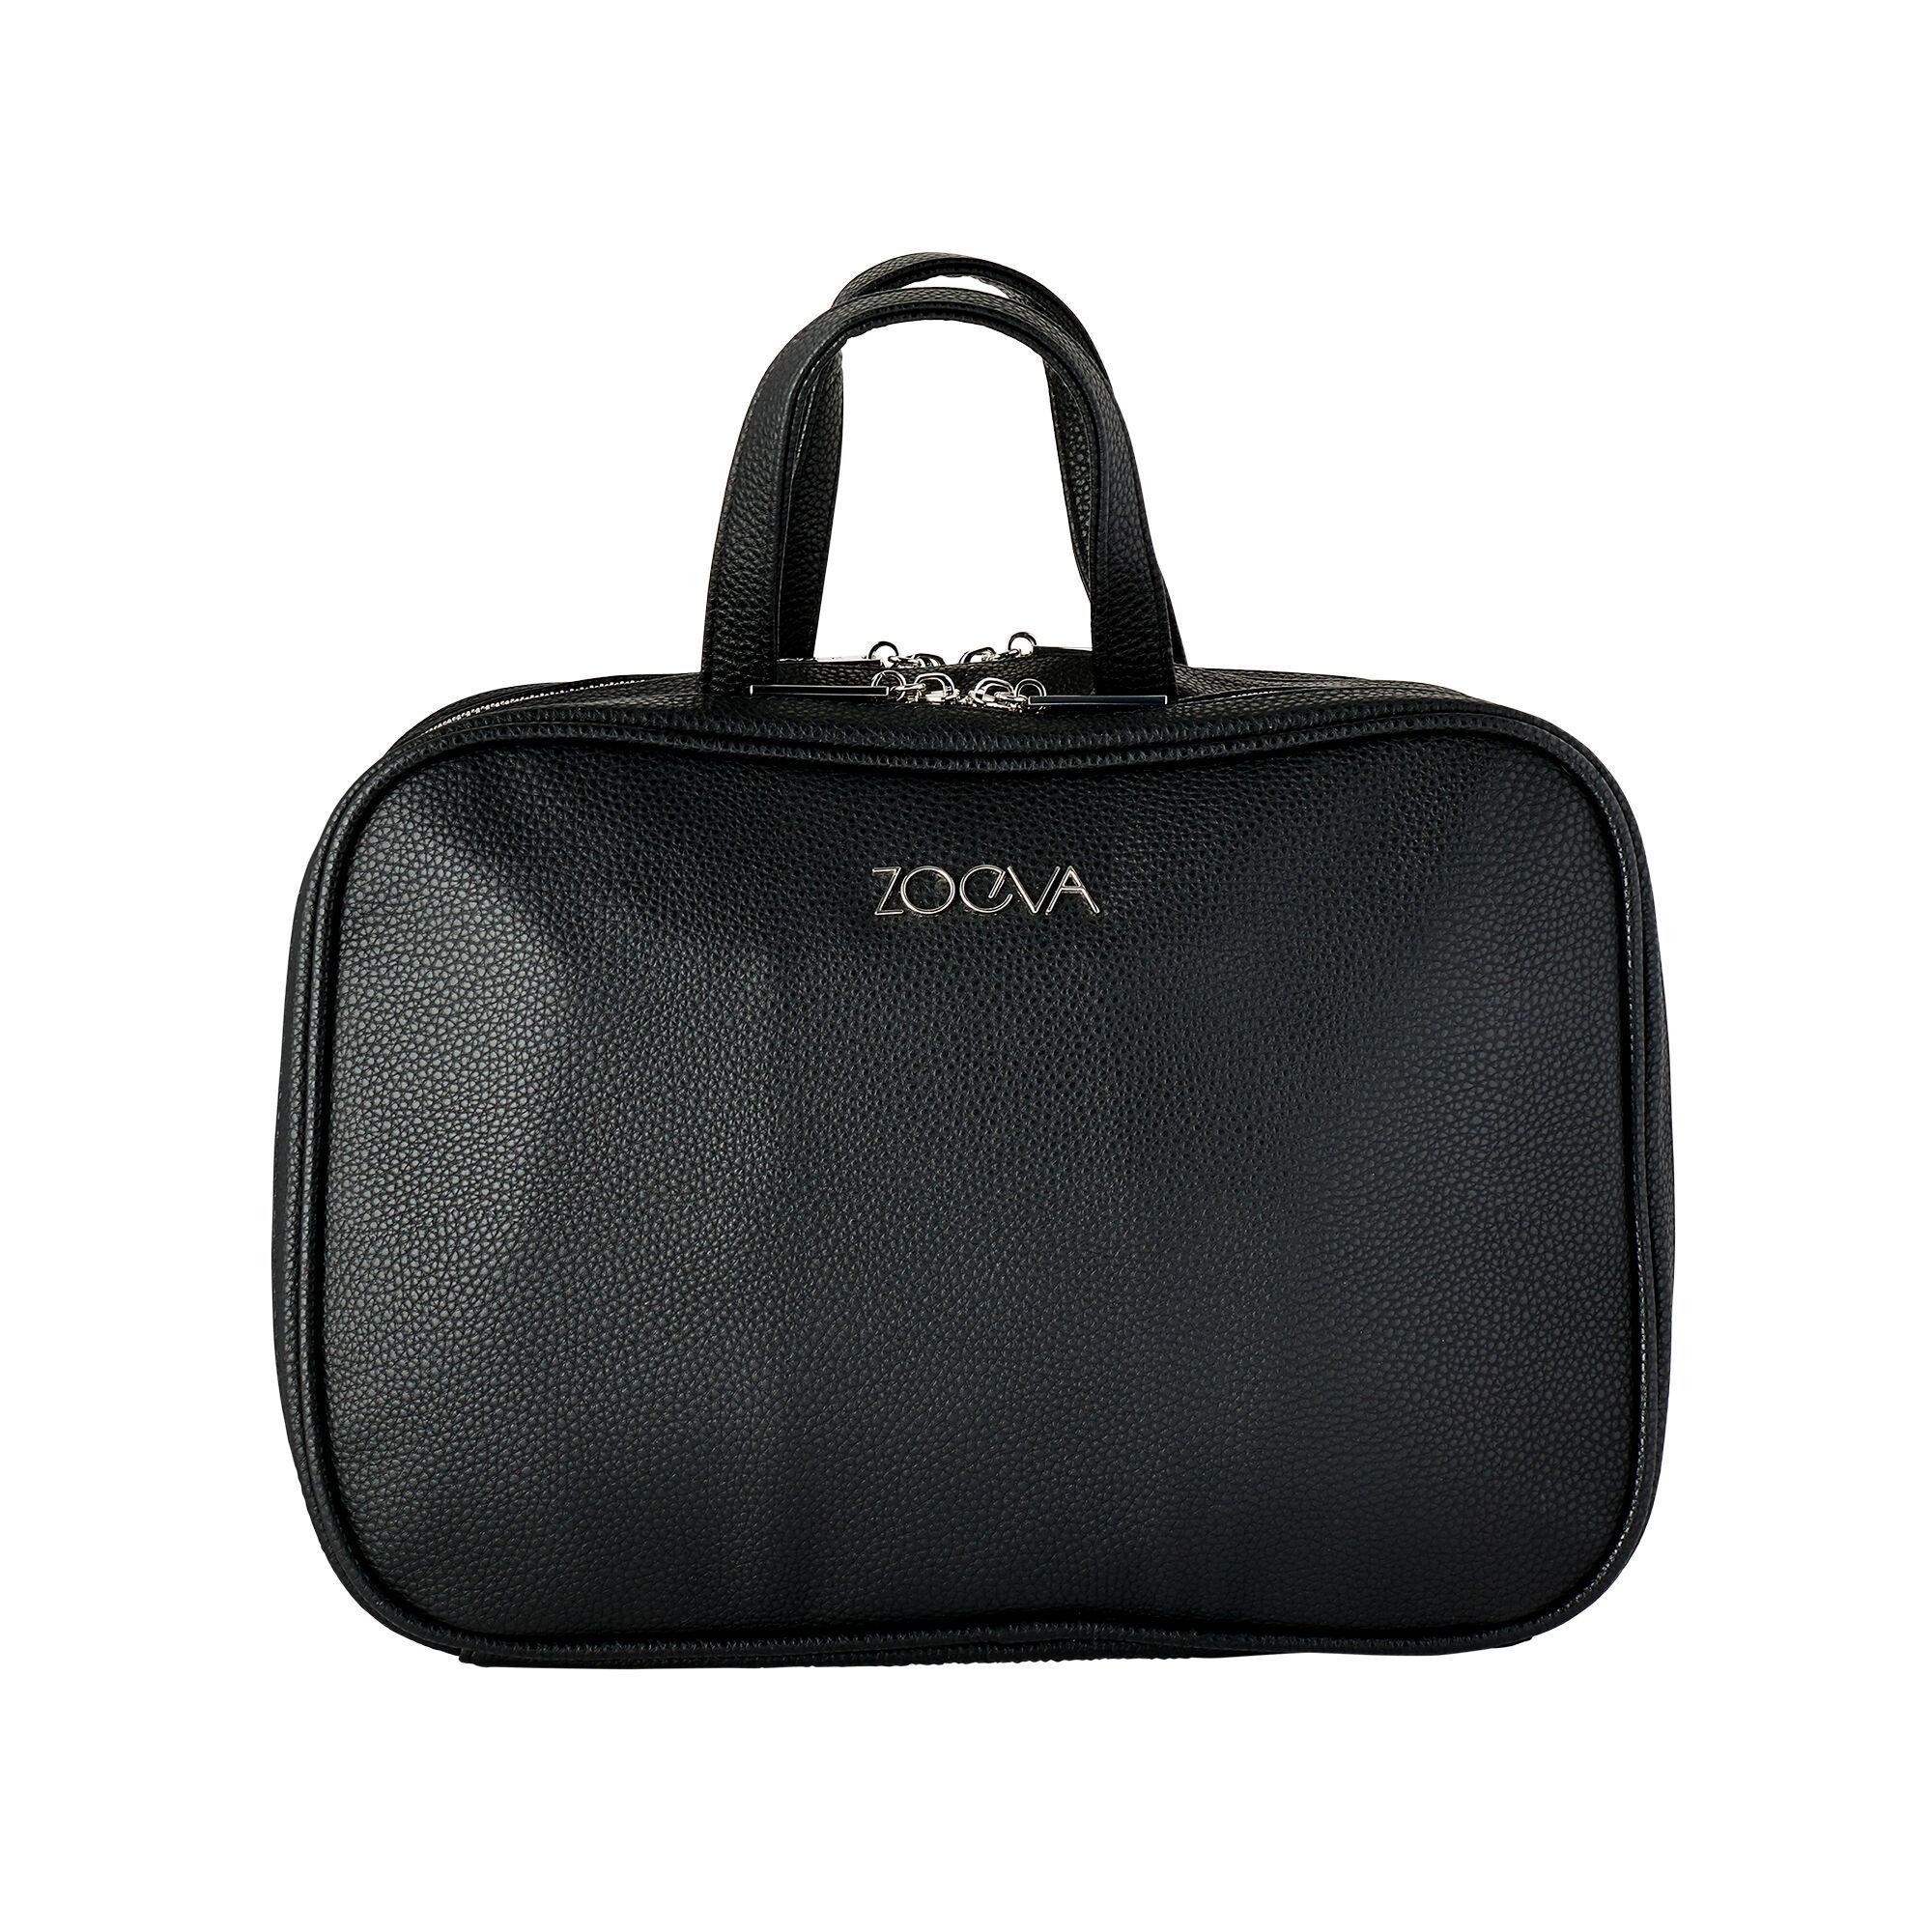 ZOEVA Makeup Tote Zoe Bag